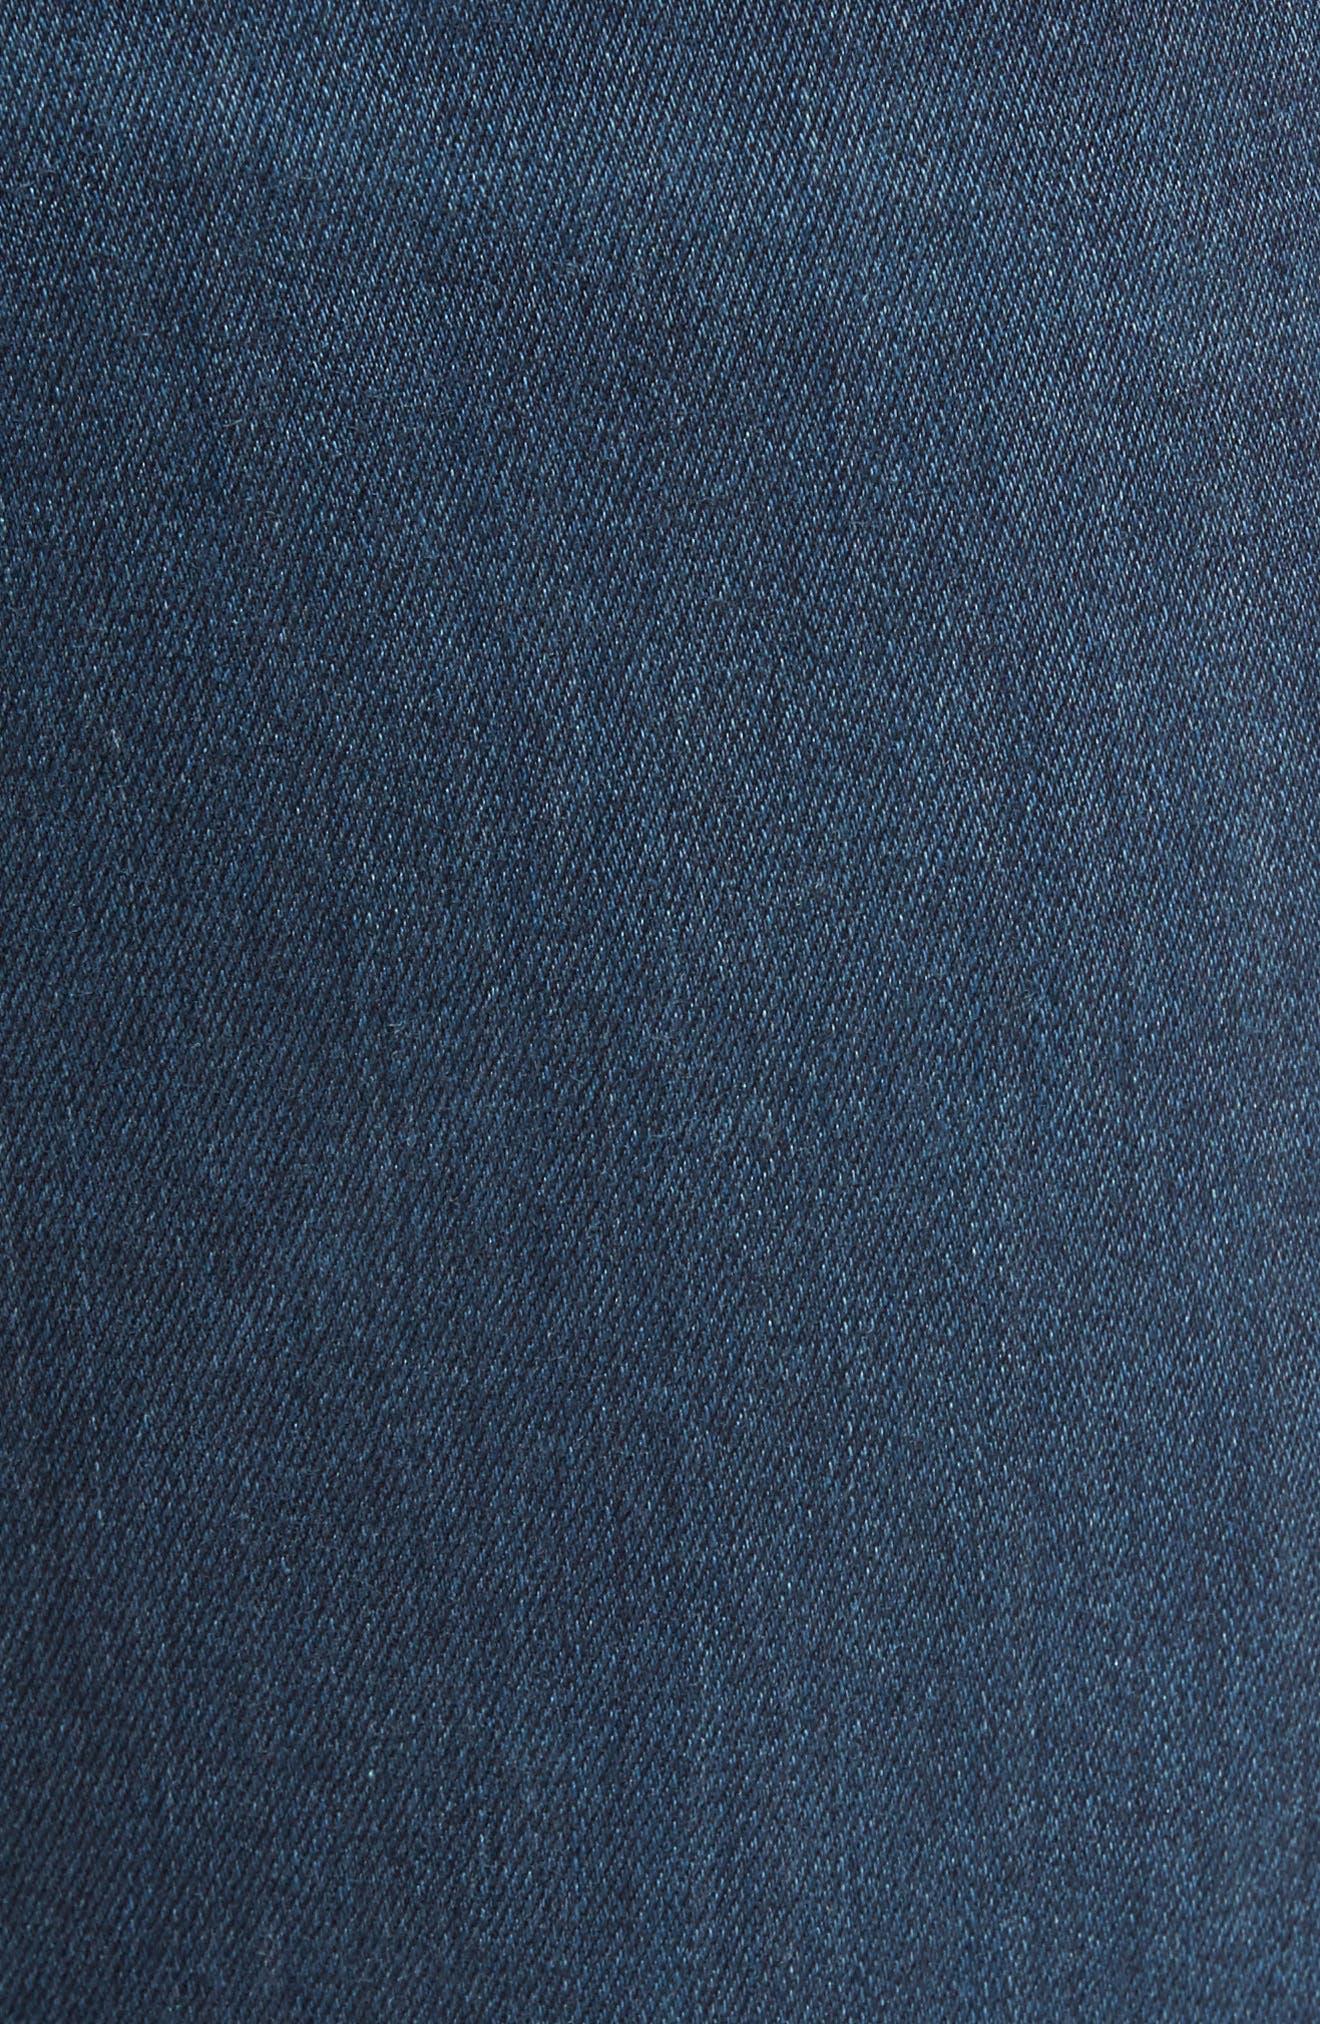 Transcend - Federal Slim Straight Fit Jeans,                             Alternate thumbnail 5, color,                             Elroy